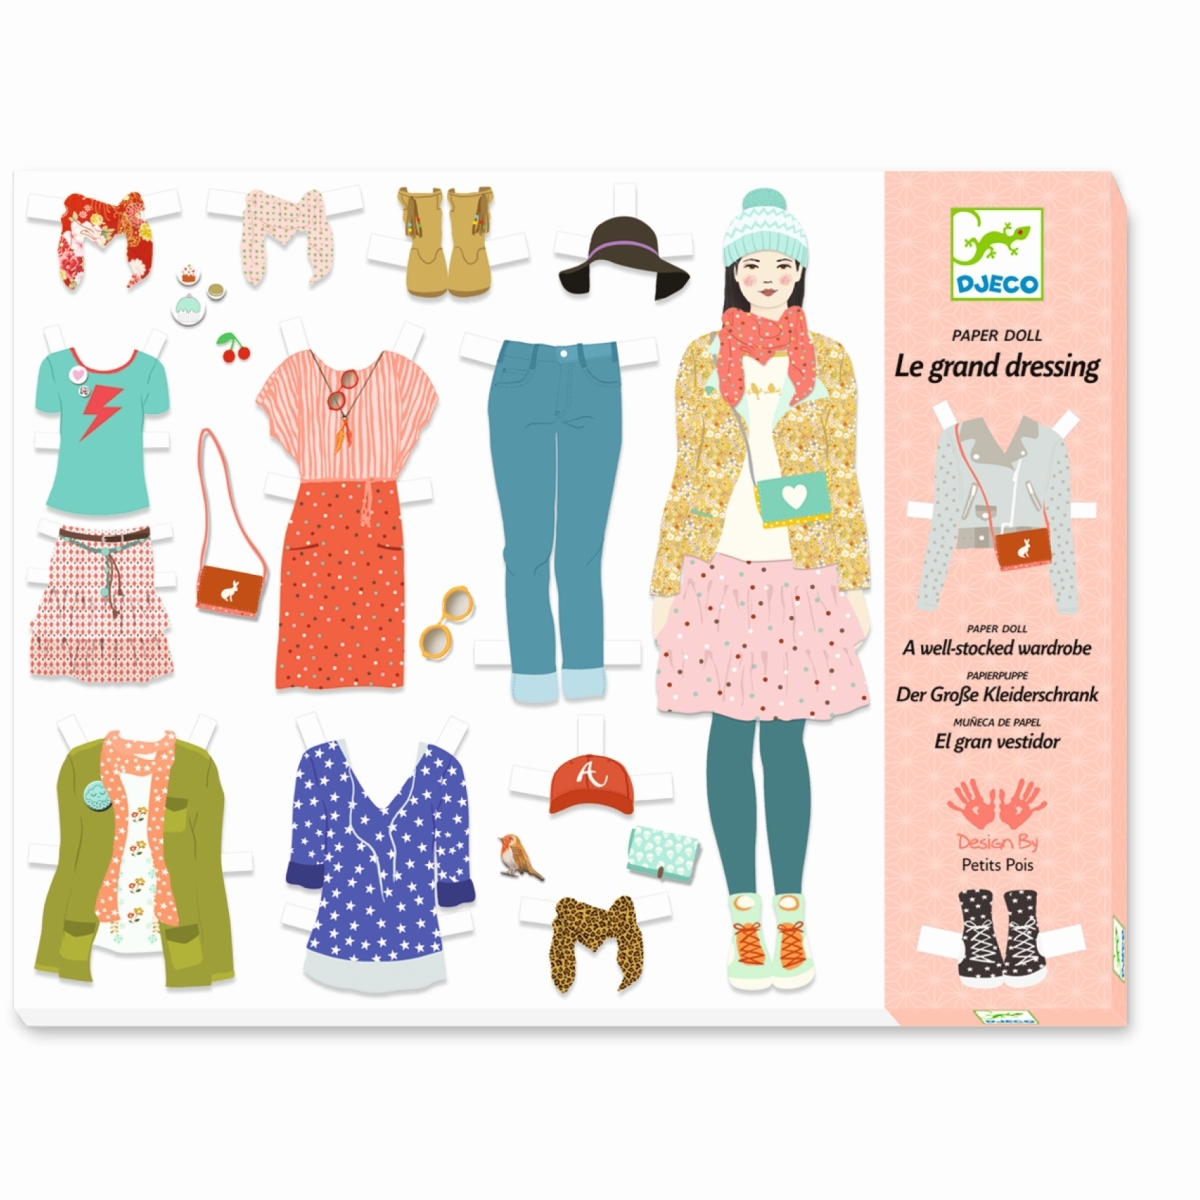 Djeco - Anziehpuppen: Der große Kleiderschrank